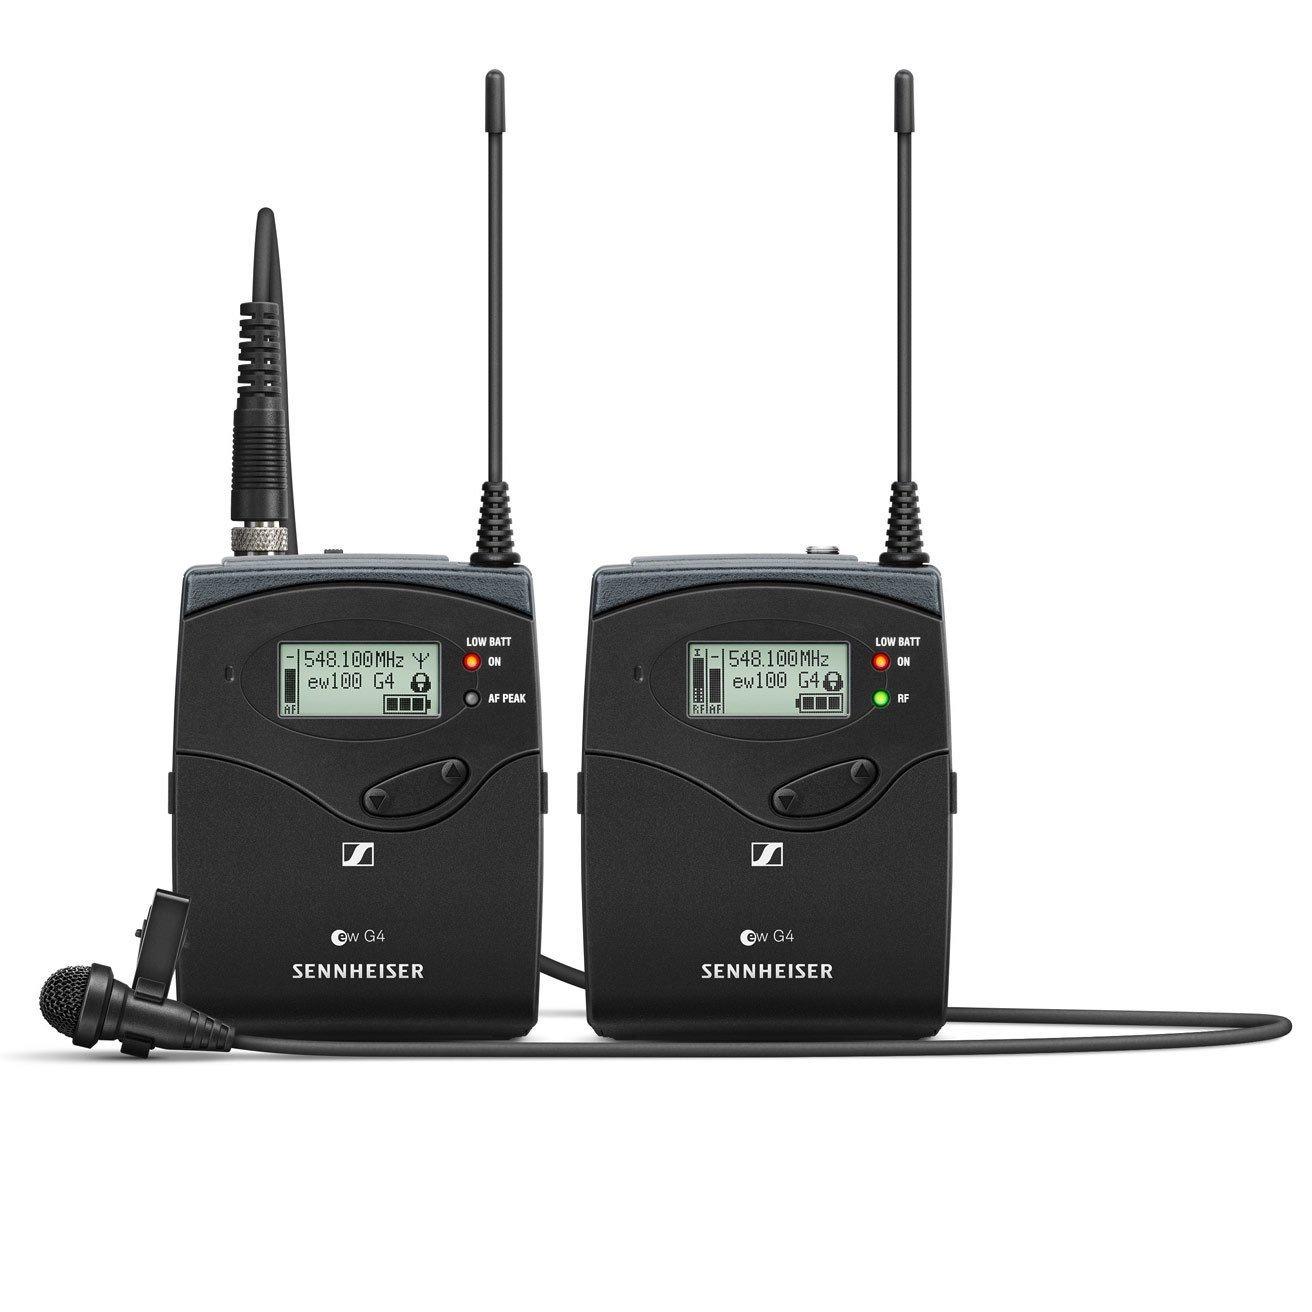 Sennheiser EW 112P G4-A, купить радиосистему Sennheiser EW 112P G4-A